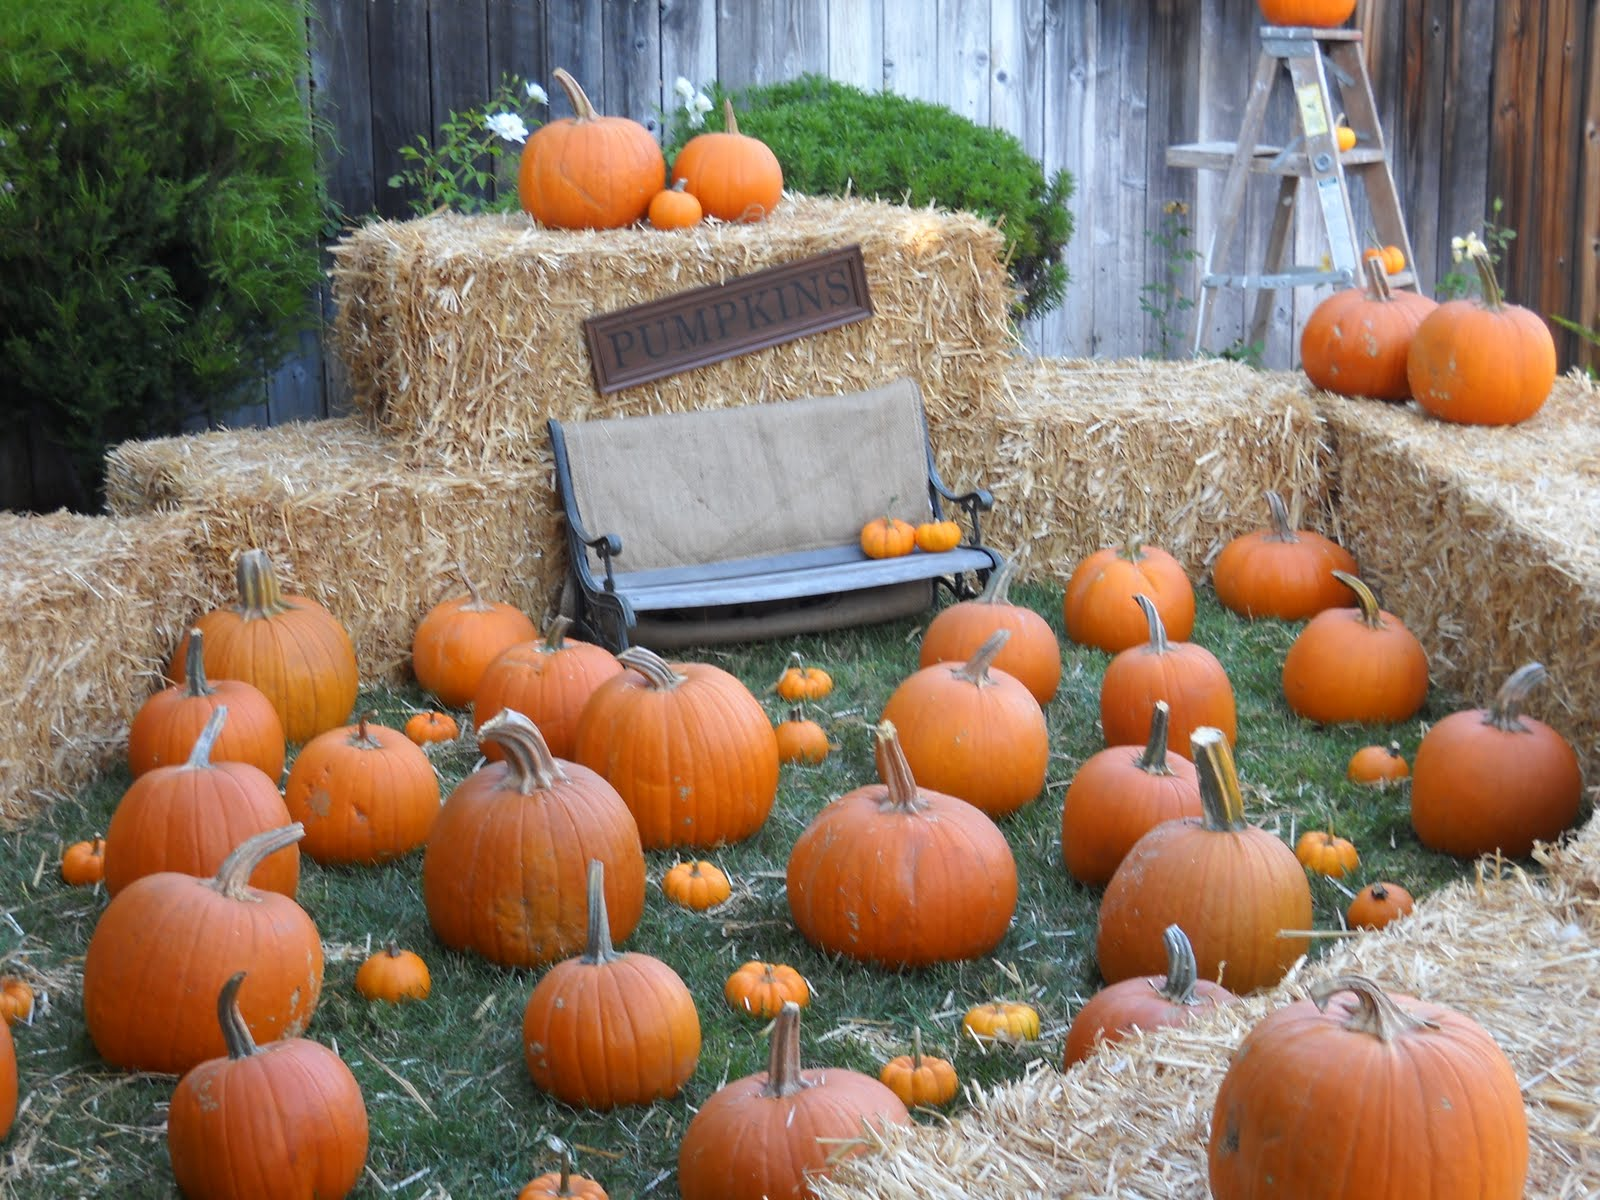 pumpkin patch photo ideas - rosespetitemaison Baby Jake s First Birthday or Pumpkin